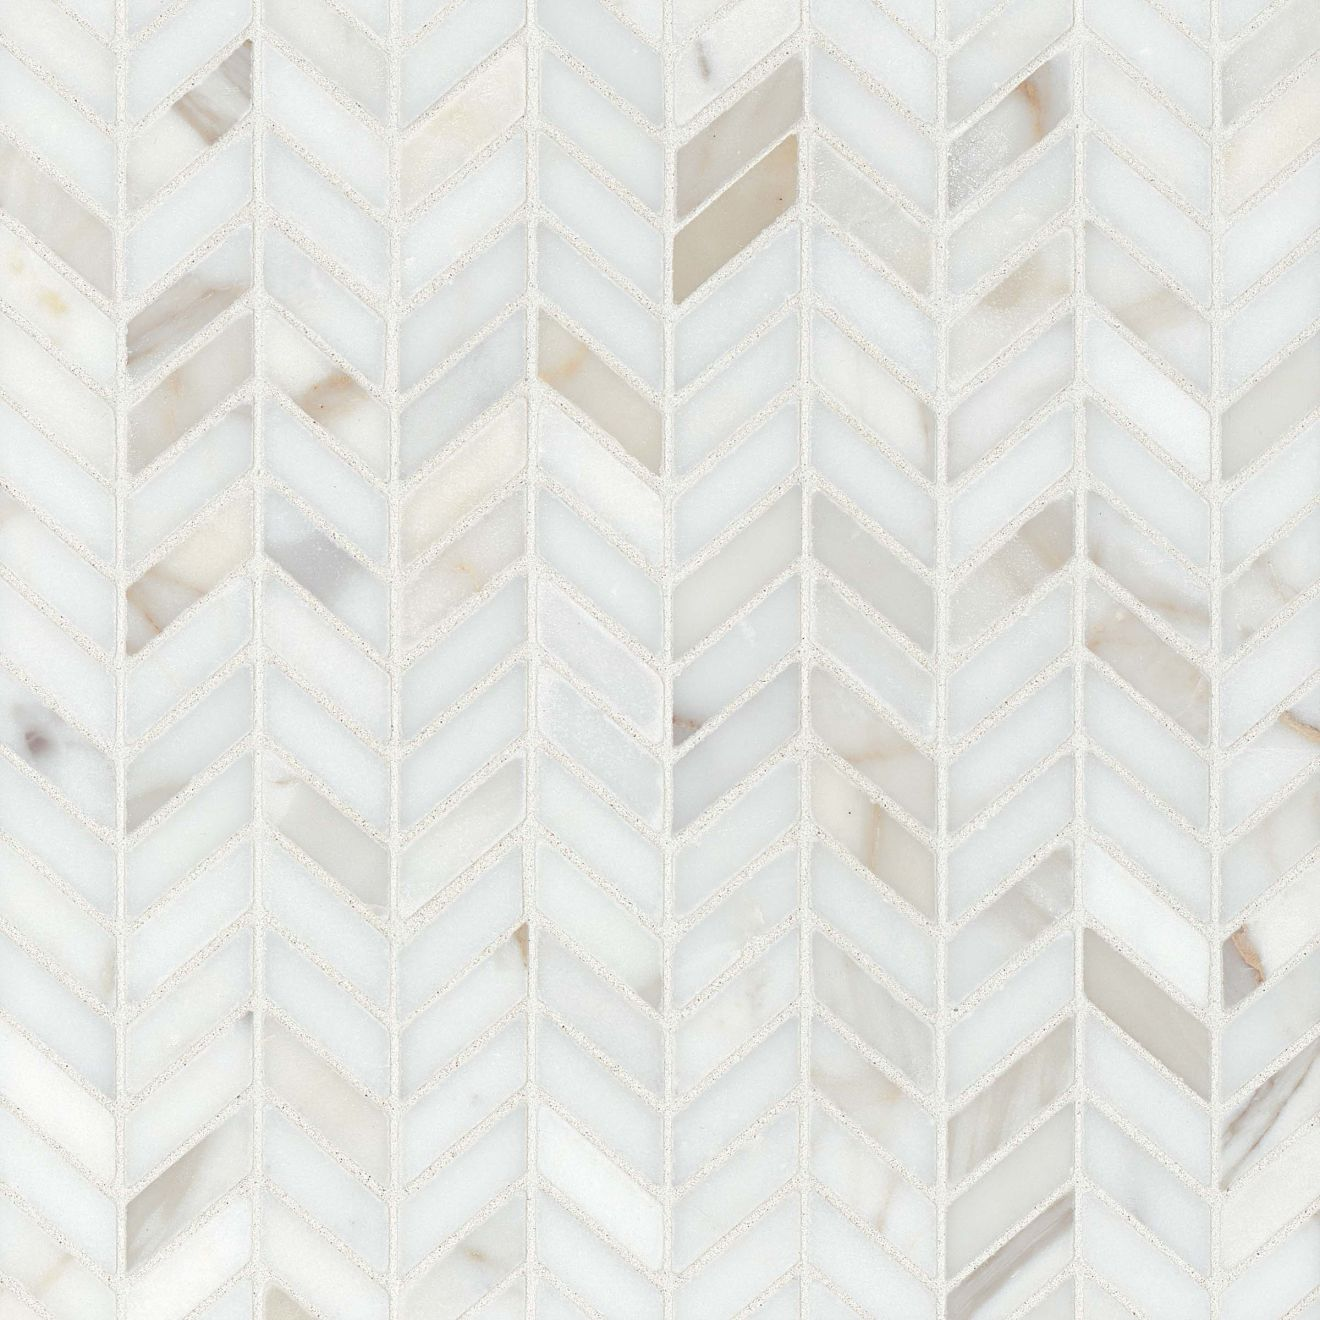 Calacatta Chevron Honed Marble Mosaic Tile in White